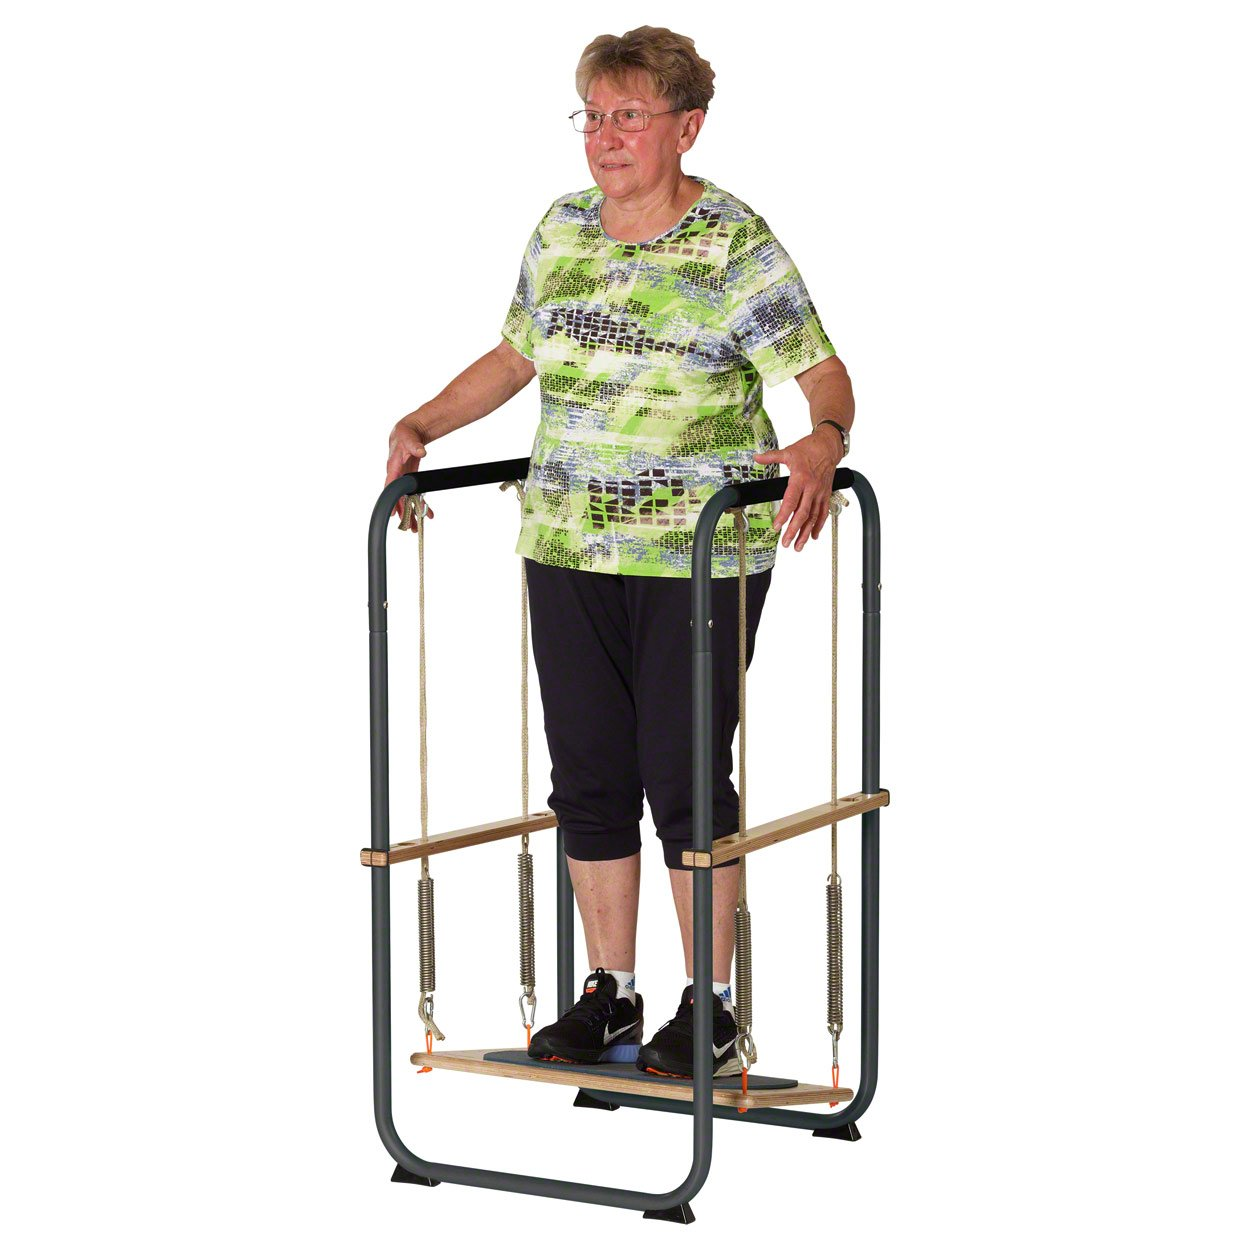 Pedalo Stabilisator Sport Balance Trainer Therapie Fitness Koordination